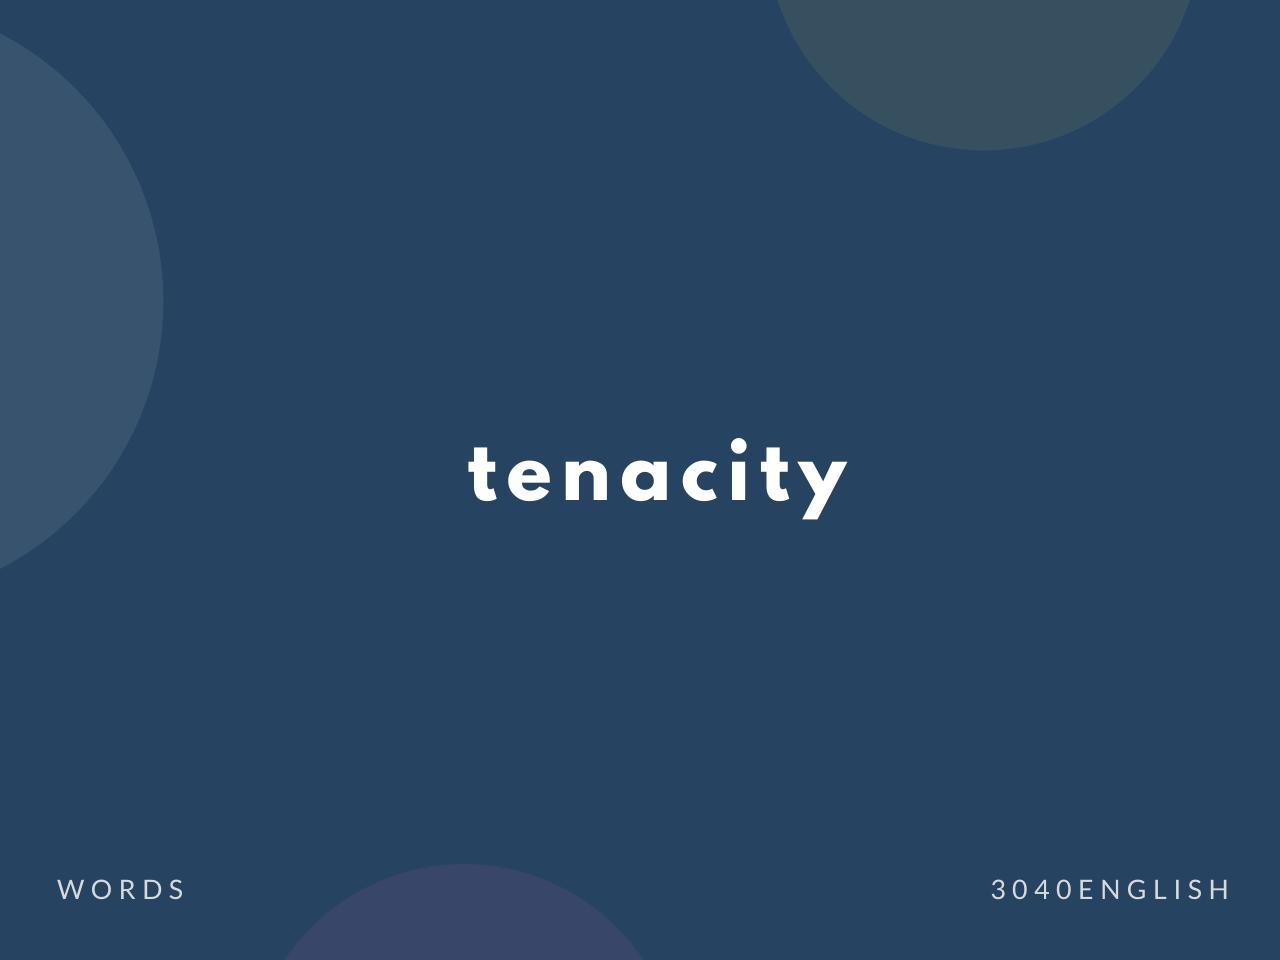 tenacity の意味と簡単な使い方【音読用例文あり】